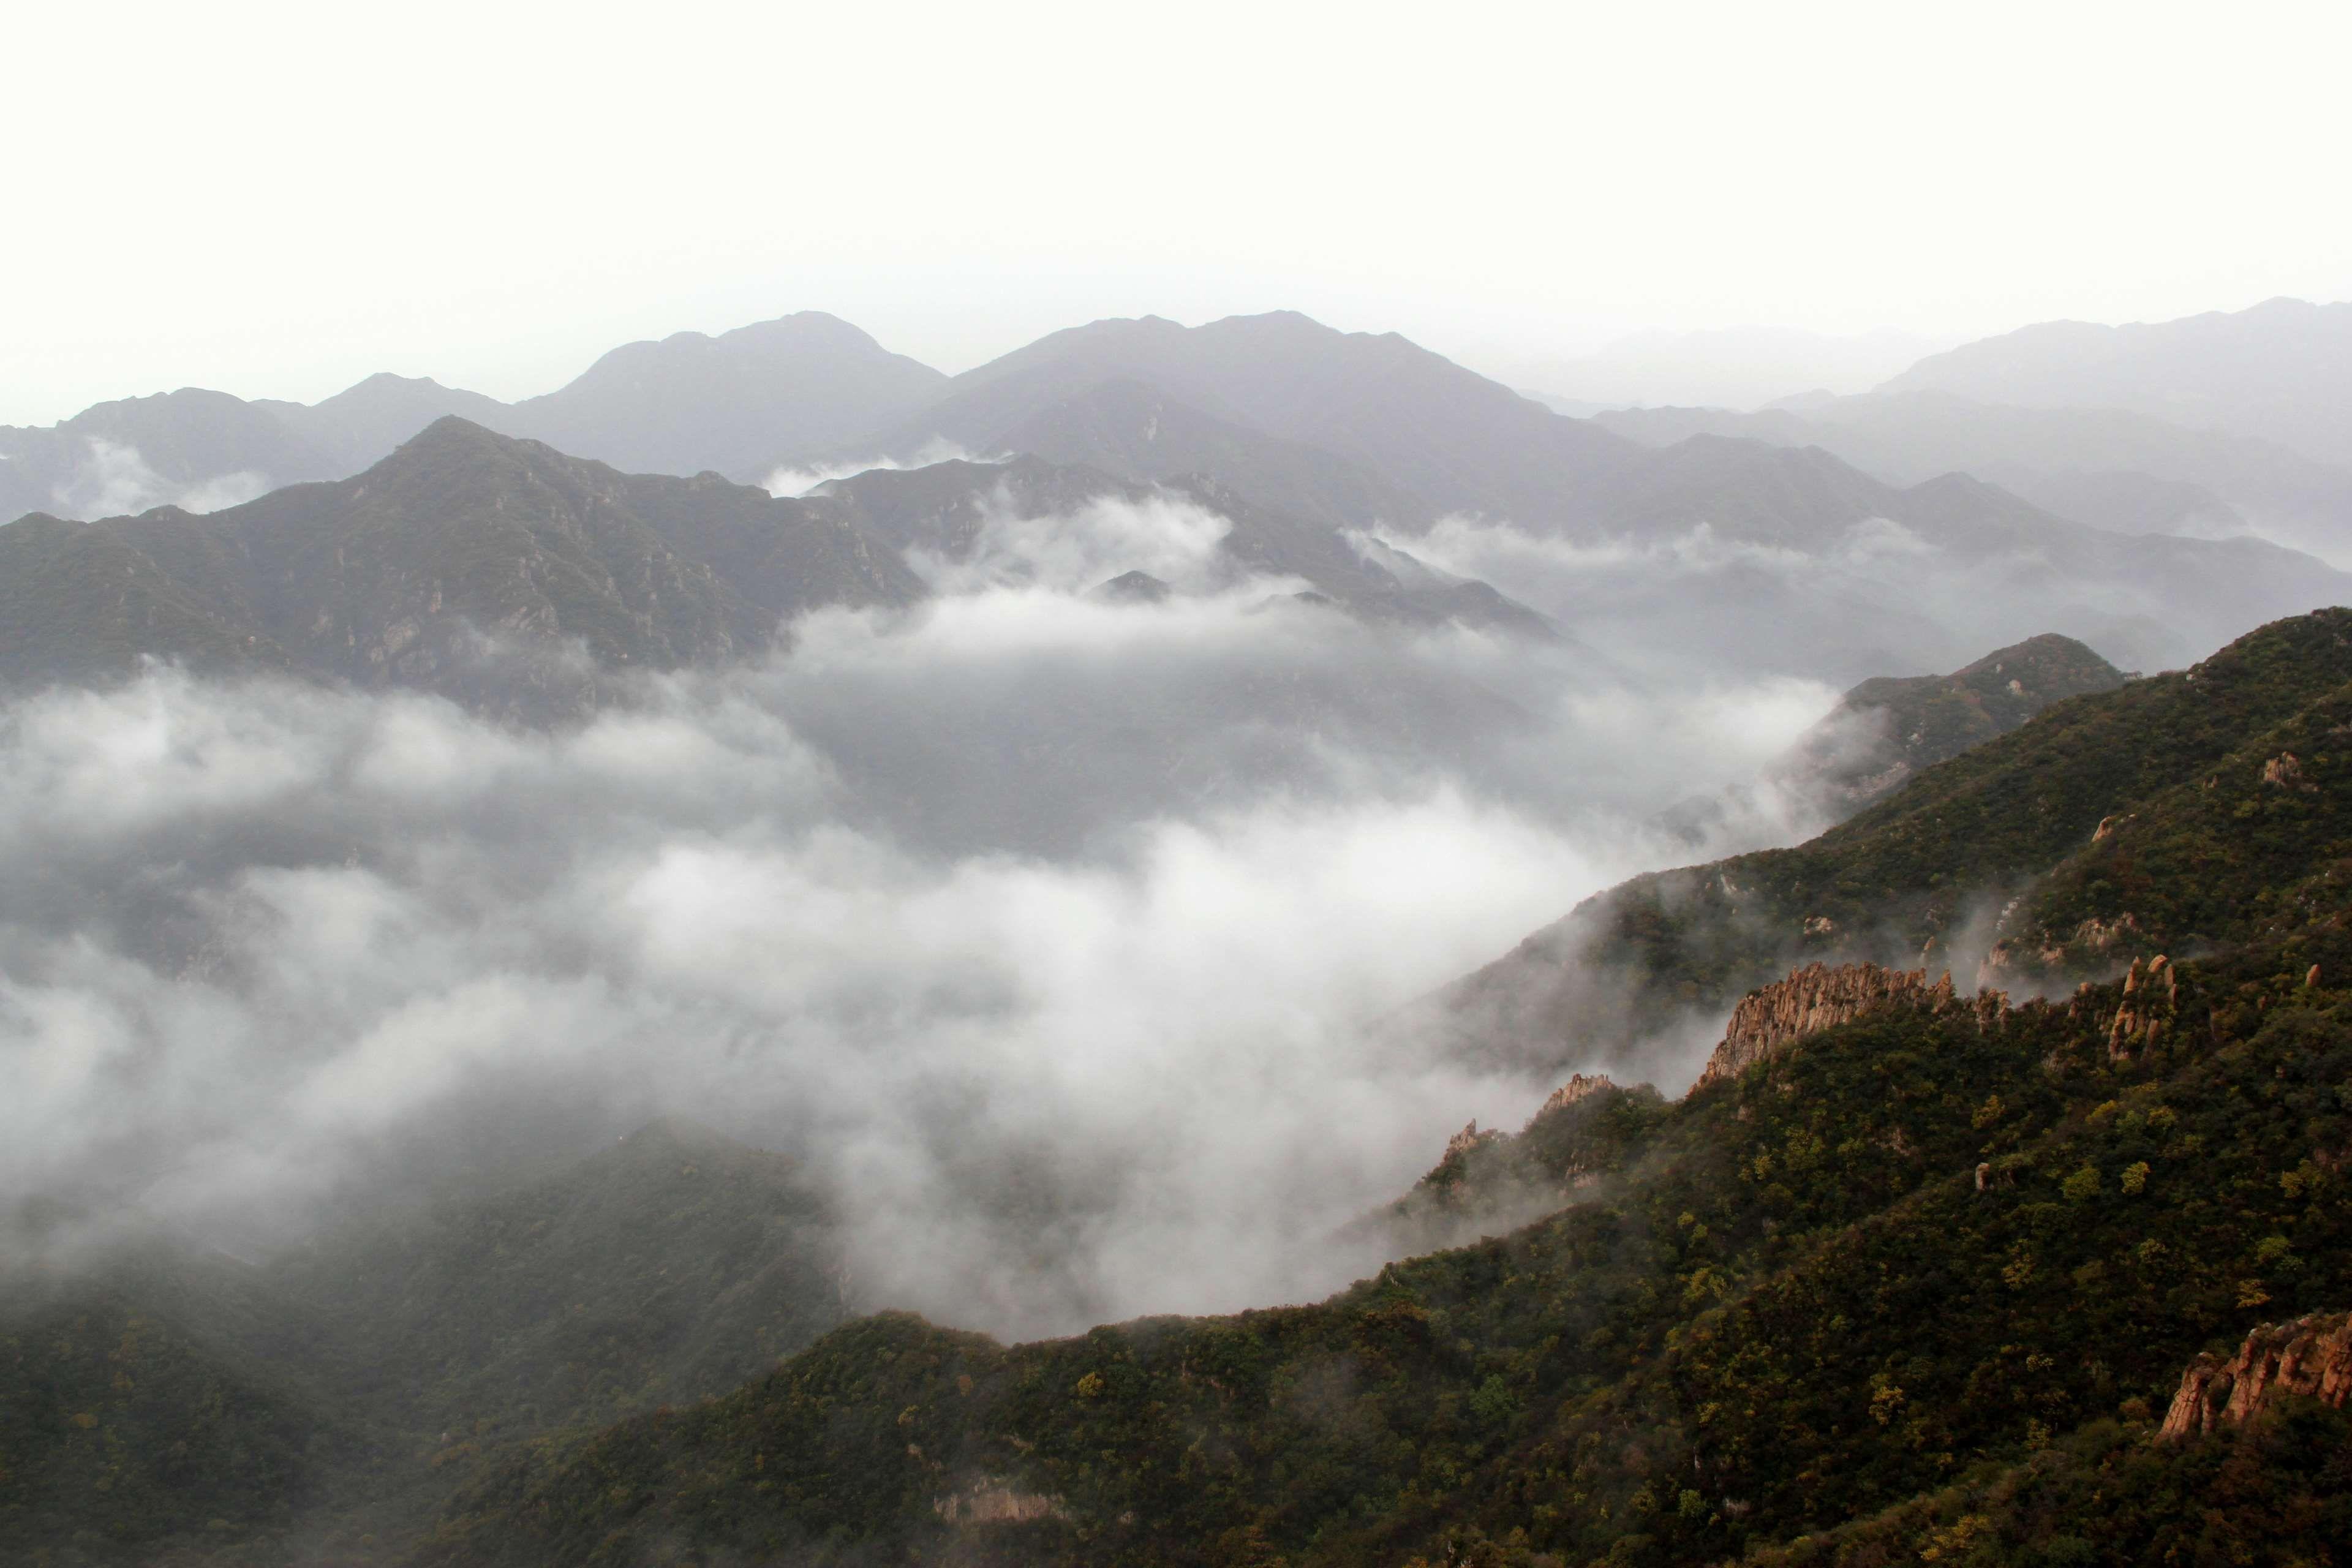 clouds, foggy, forest, landscape, mist, misty, mountains